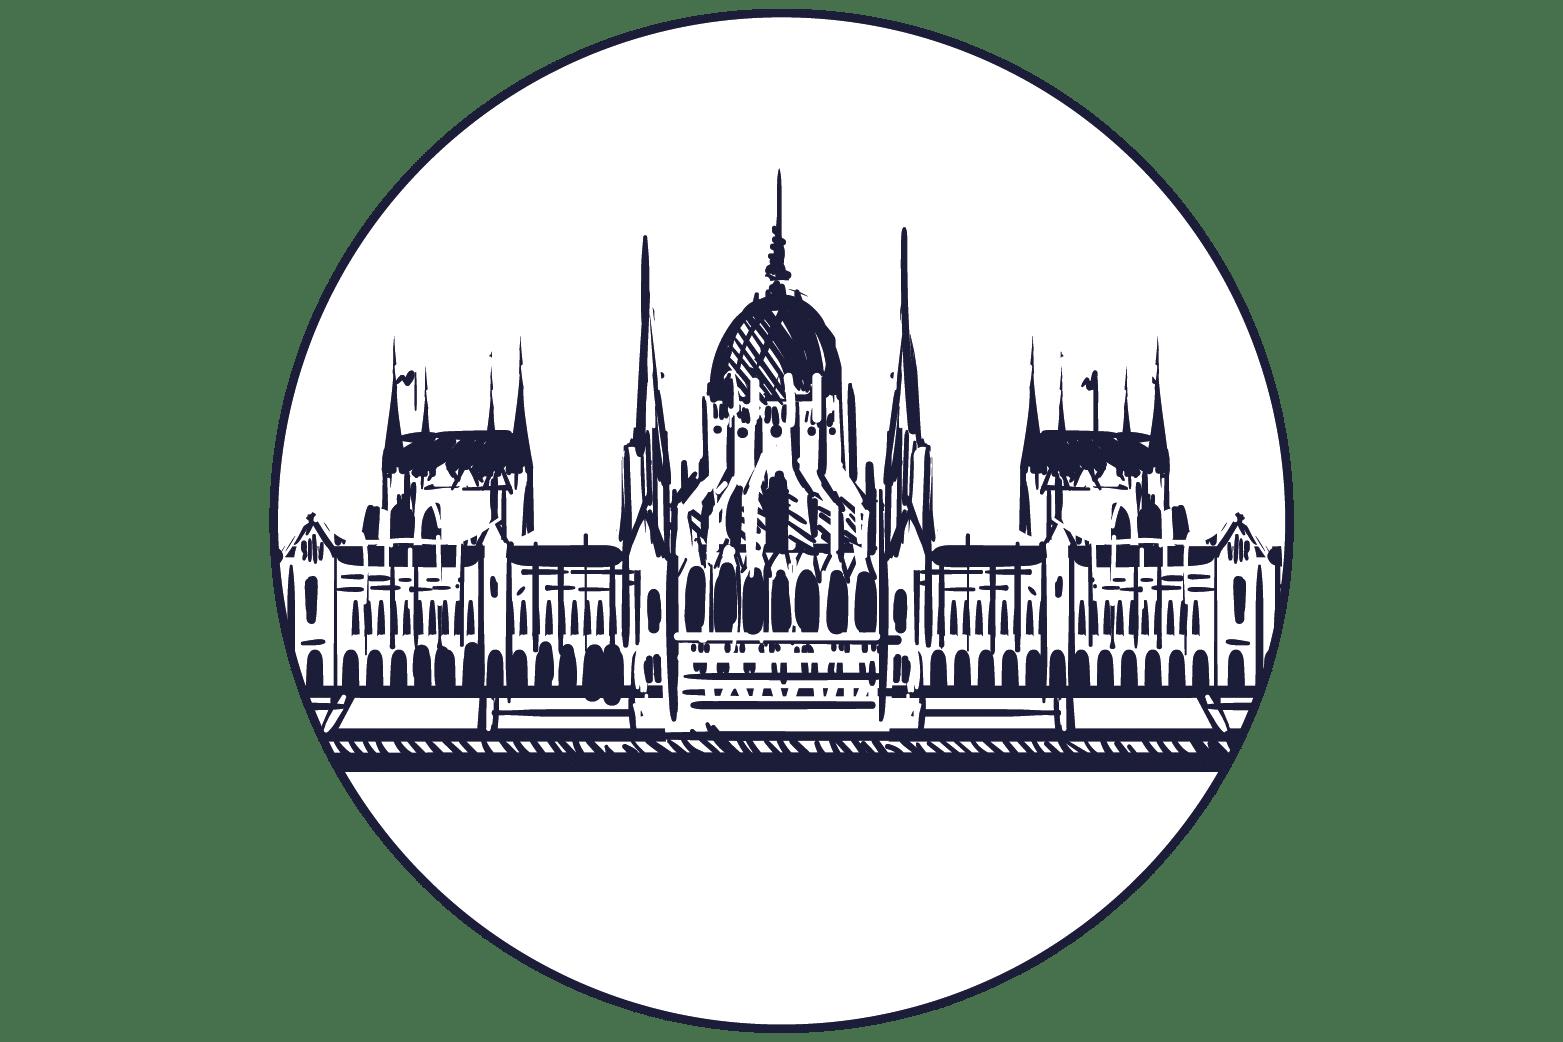 BUDAPEST ILLUSTRATION